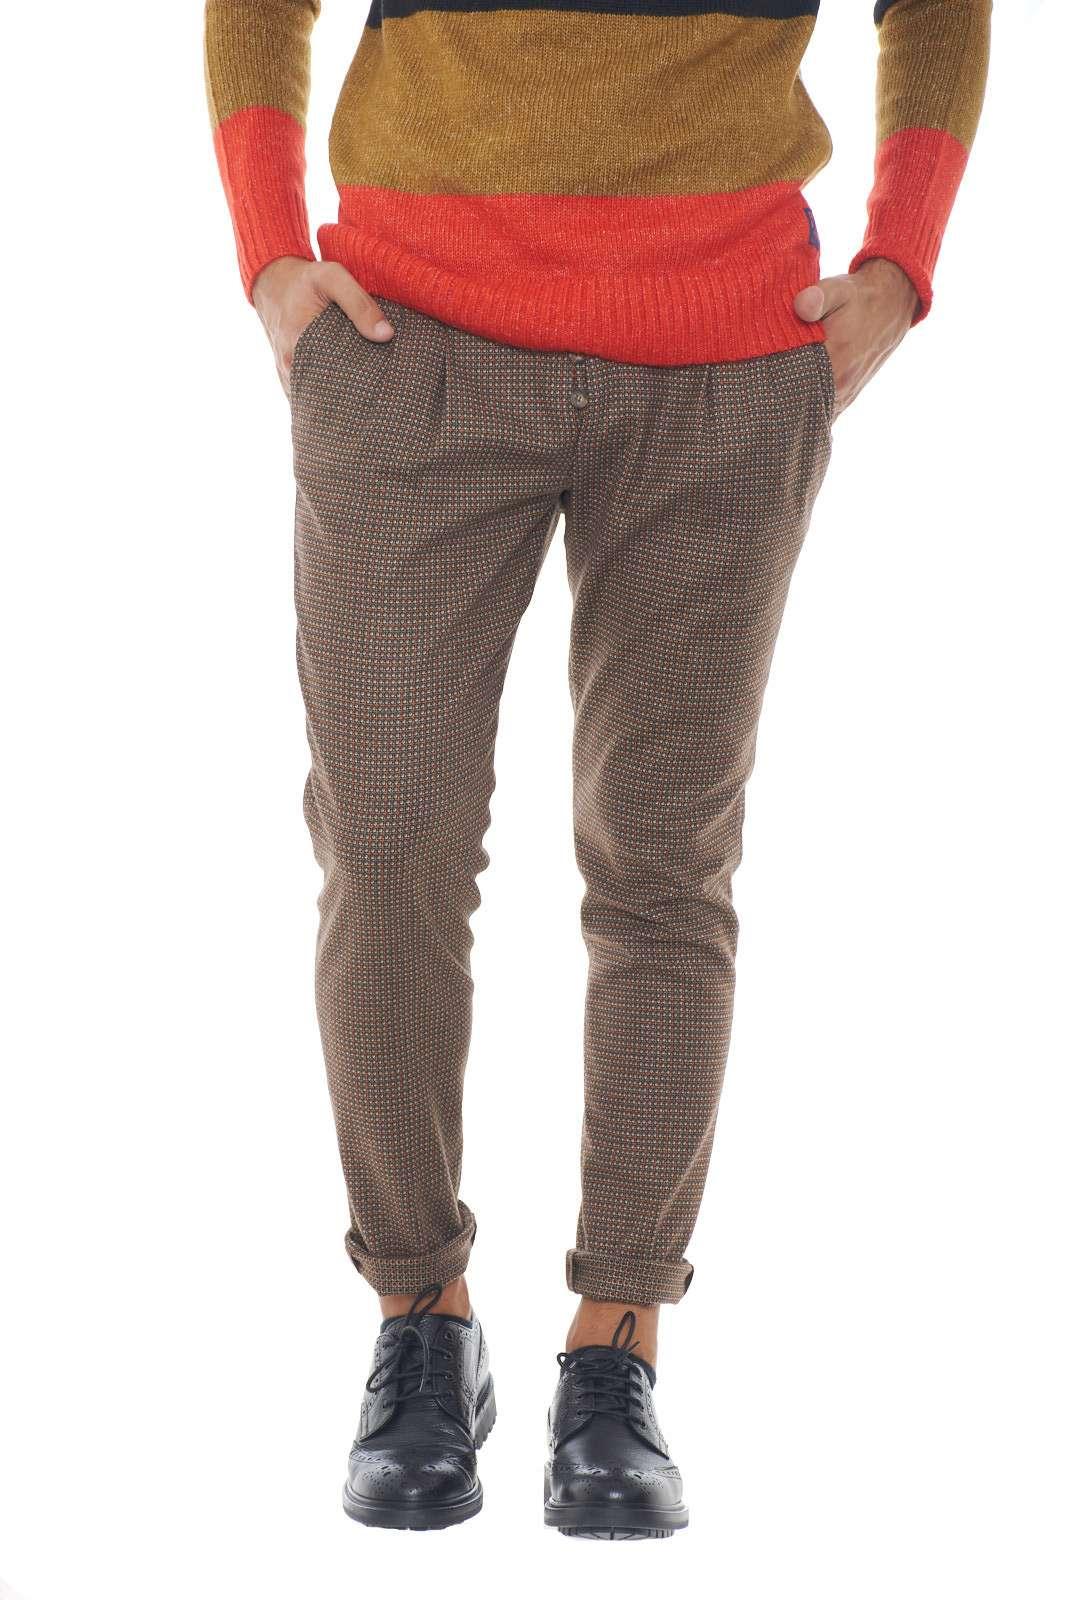 https://www.parmax.com/media/catalog/product/a/i/AI-outlet_parmax-pantaloni-uomo-Desica-FURORE%20CM%2004-A.jpg